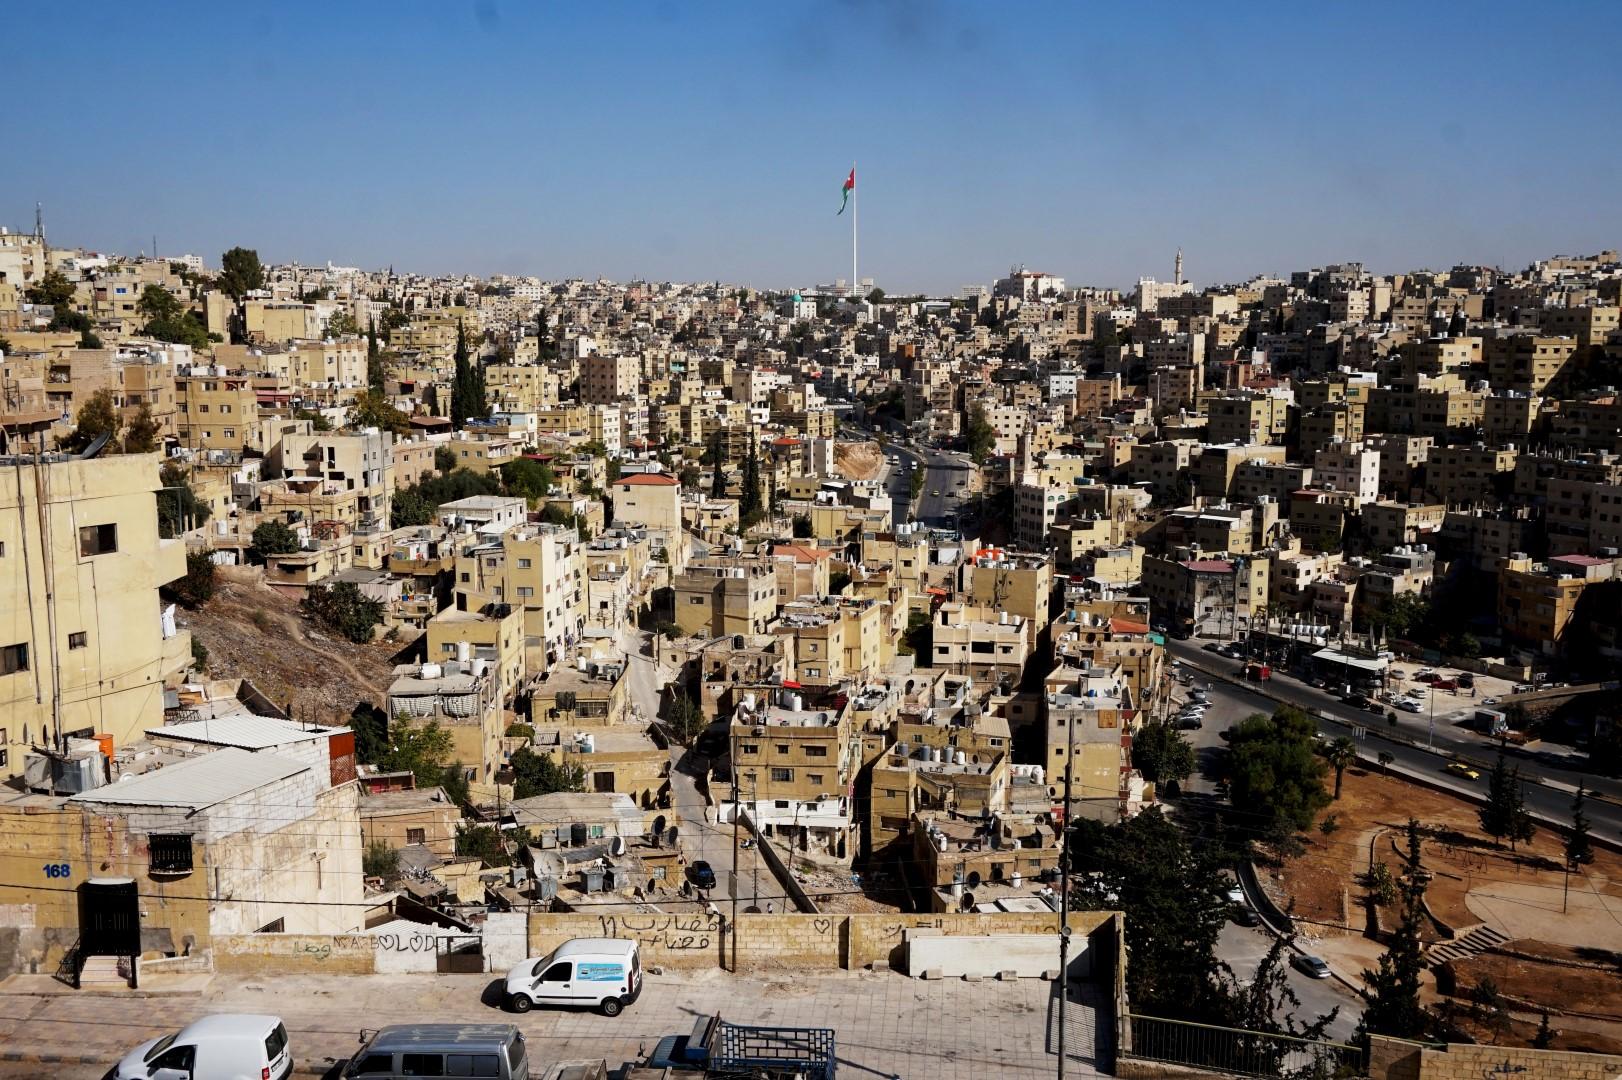 Voyage en Jordanie - Petra Wadi-Rum - Amman